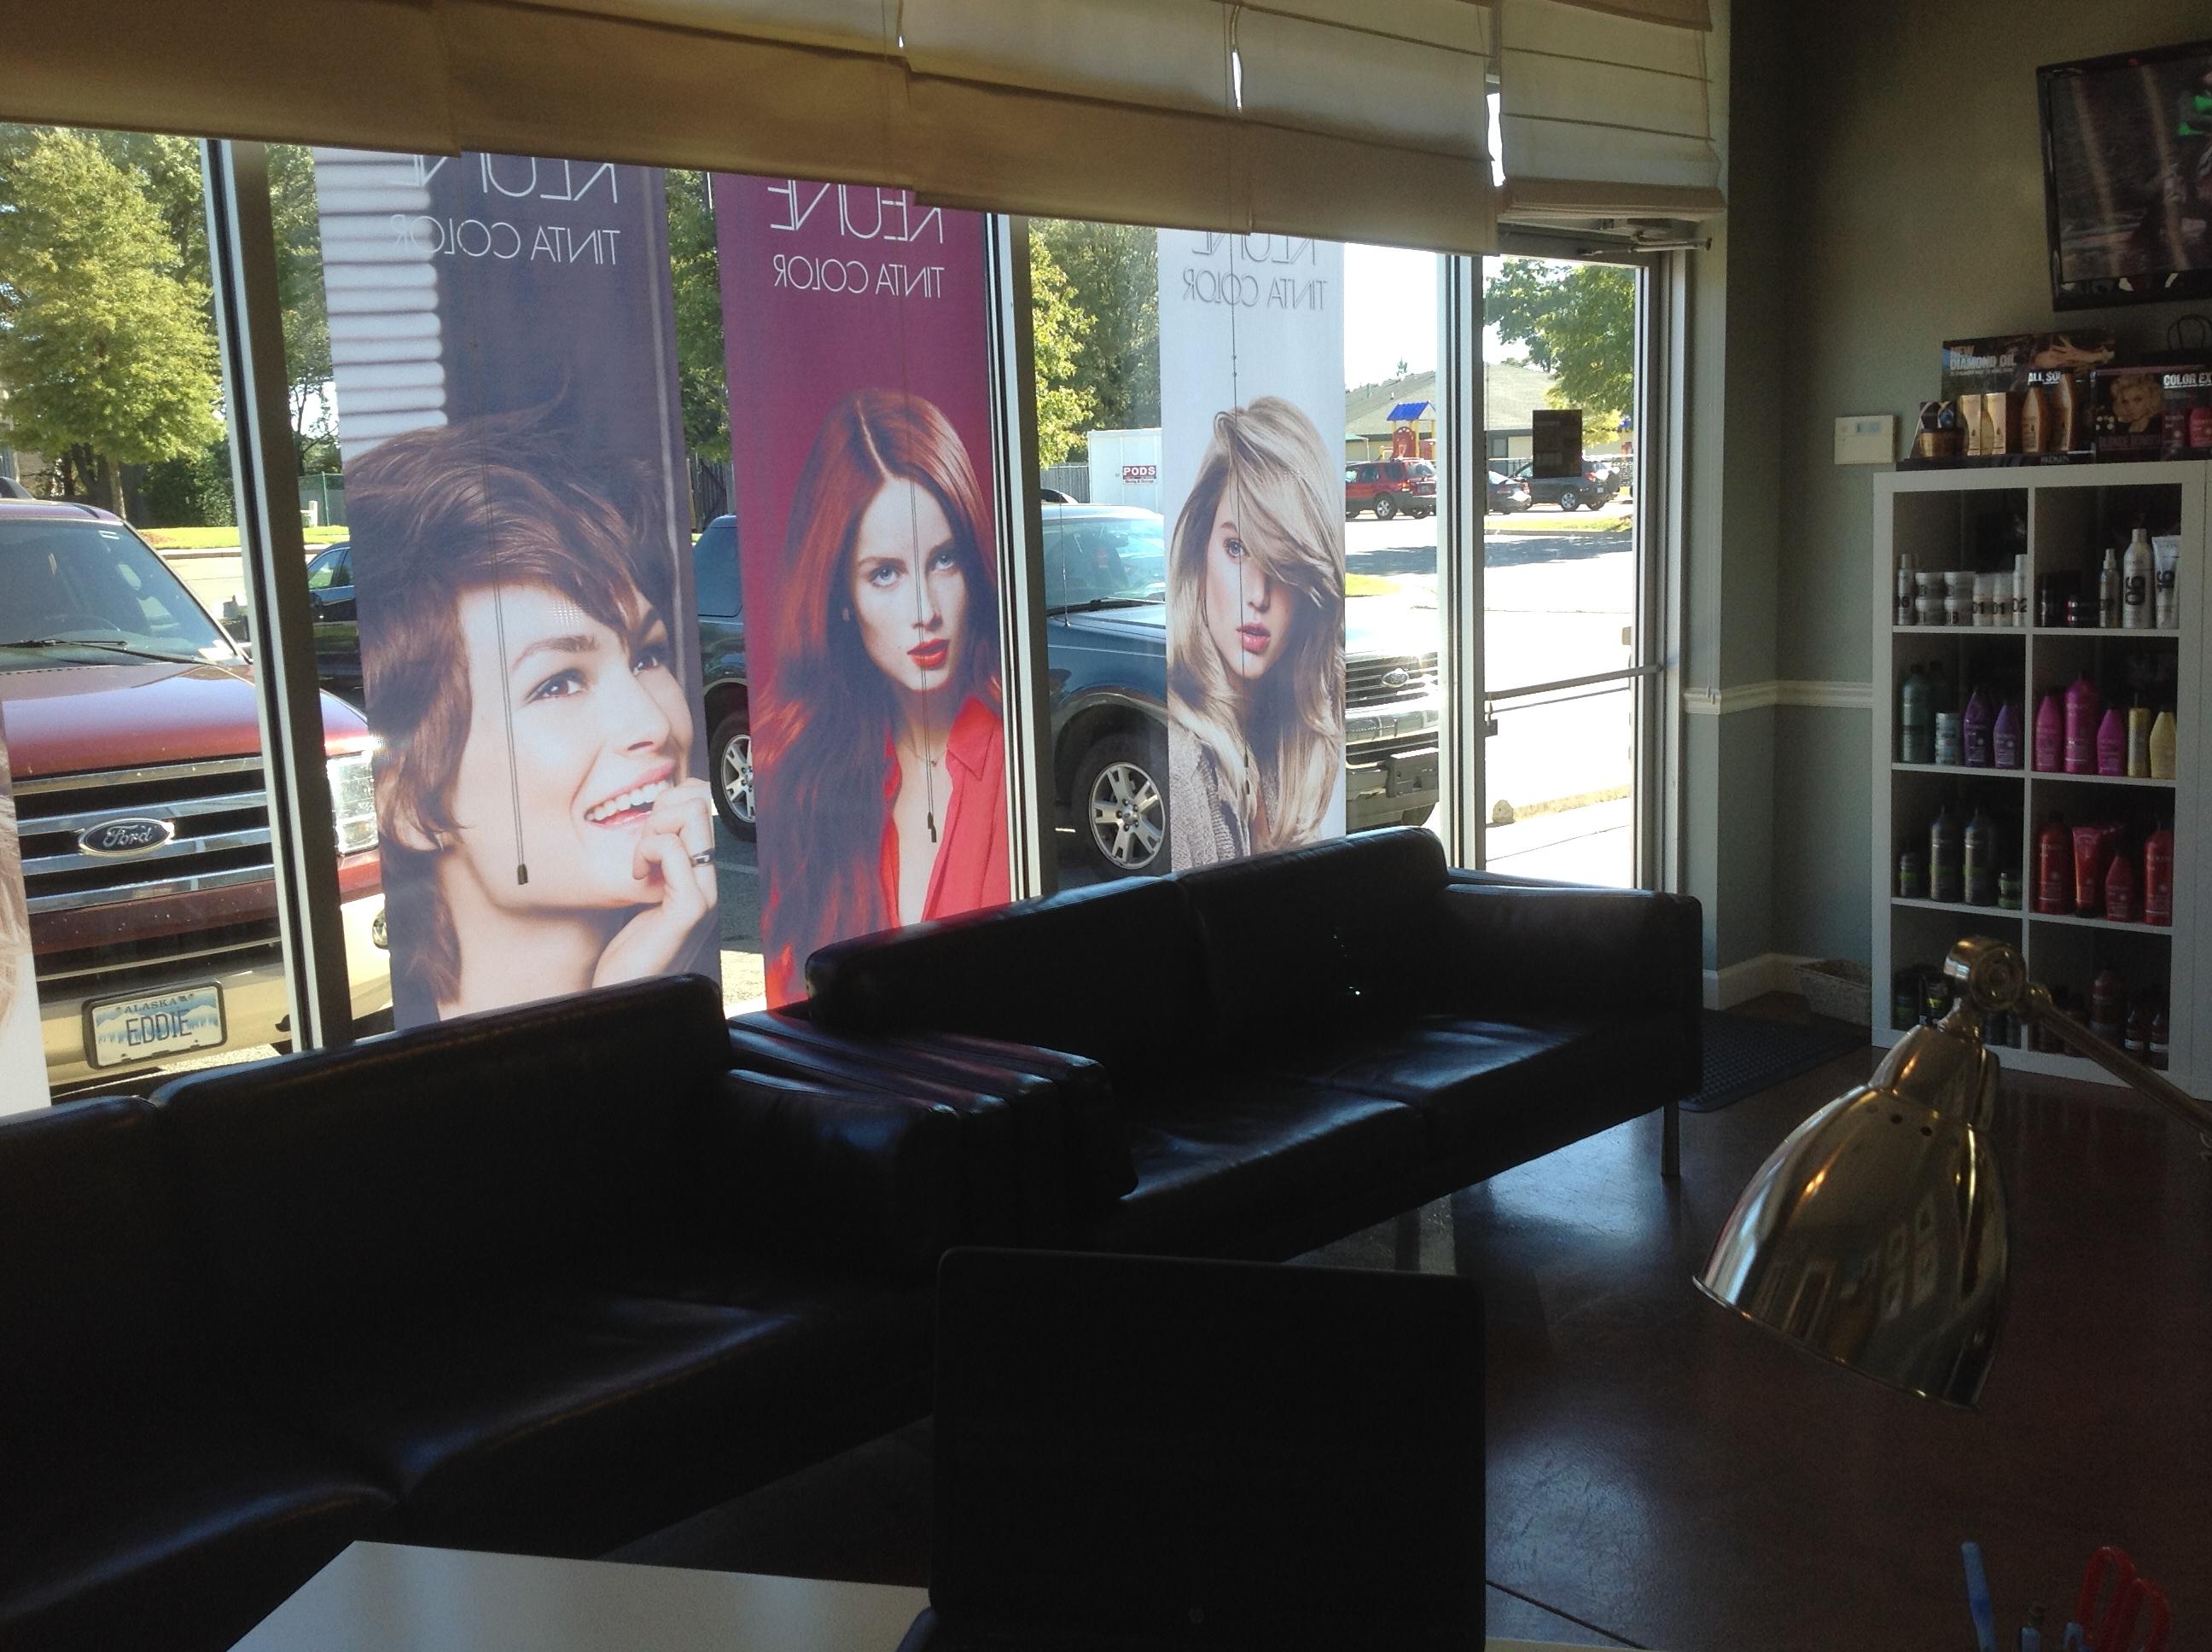 Suavity Design Salon image 7